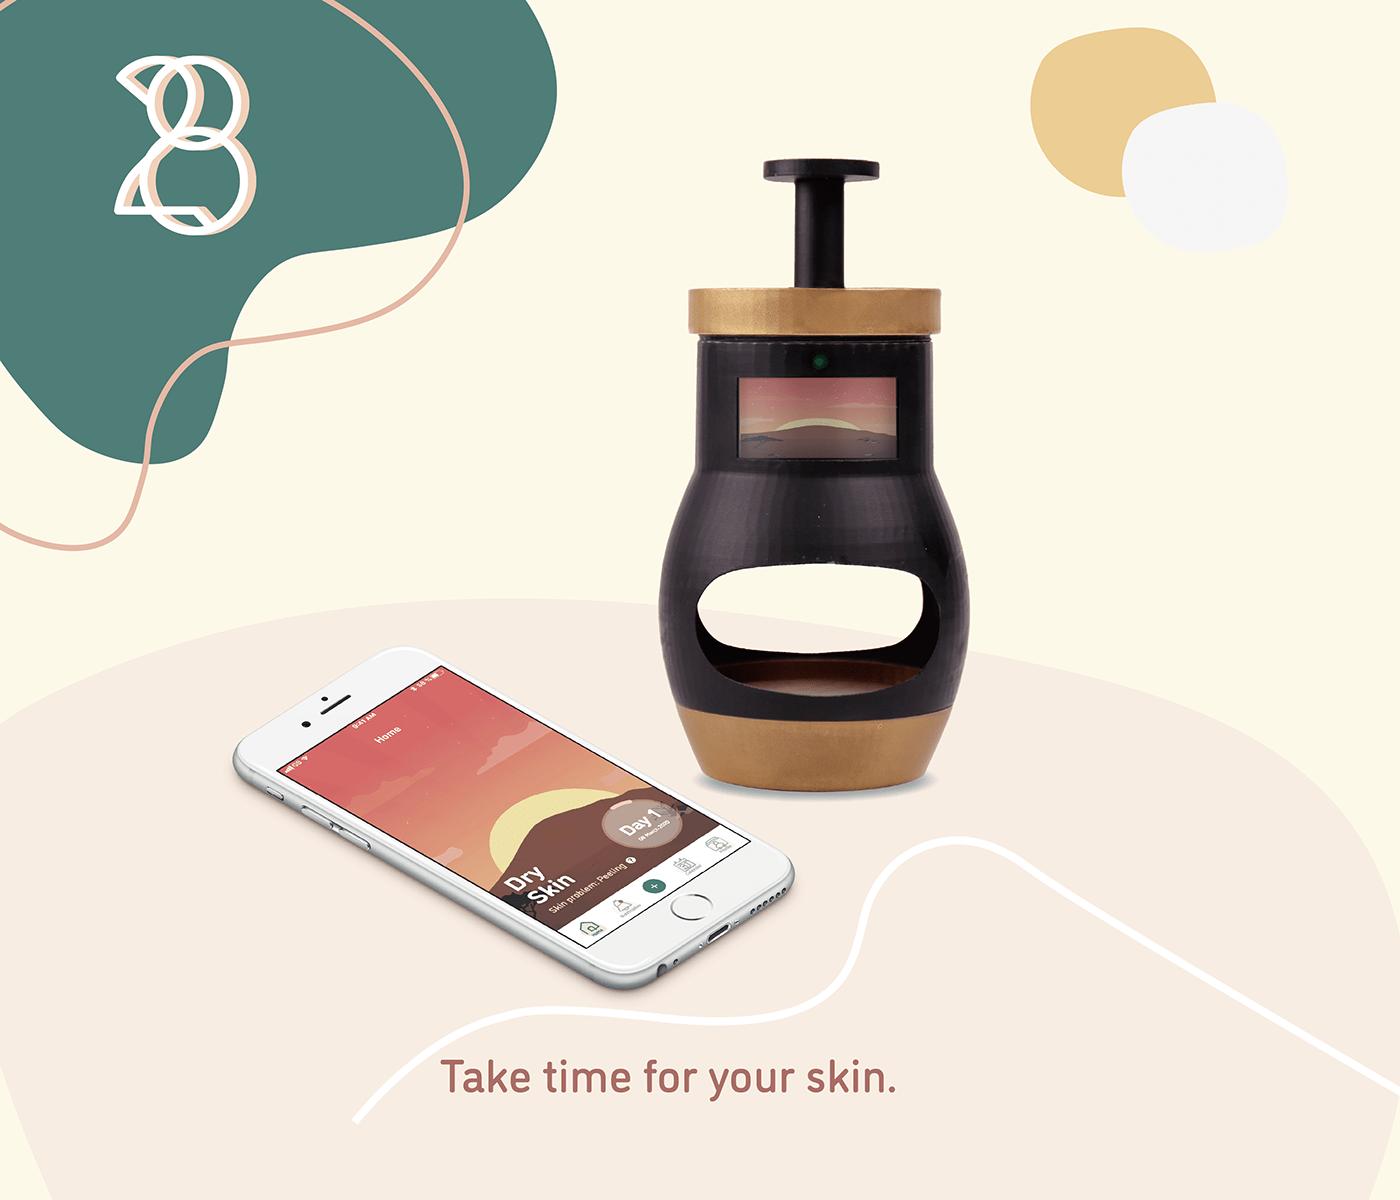 3dprinting beautyapp beautydevice BuildHabit interactivemedia PolyUDesignAnnualShow2020 productdesign skincare SkincareProblem uiuxdesign